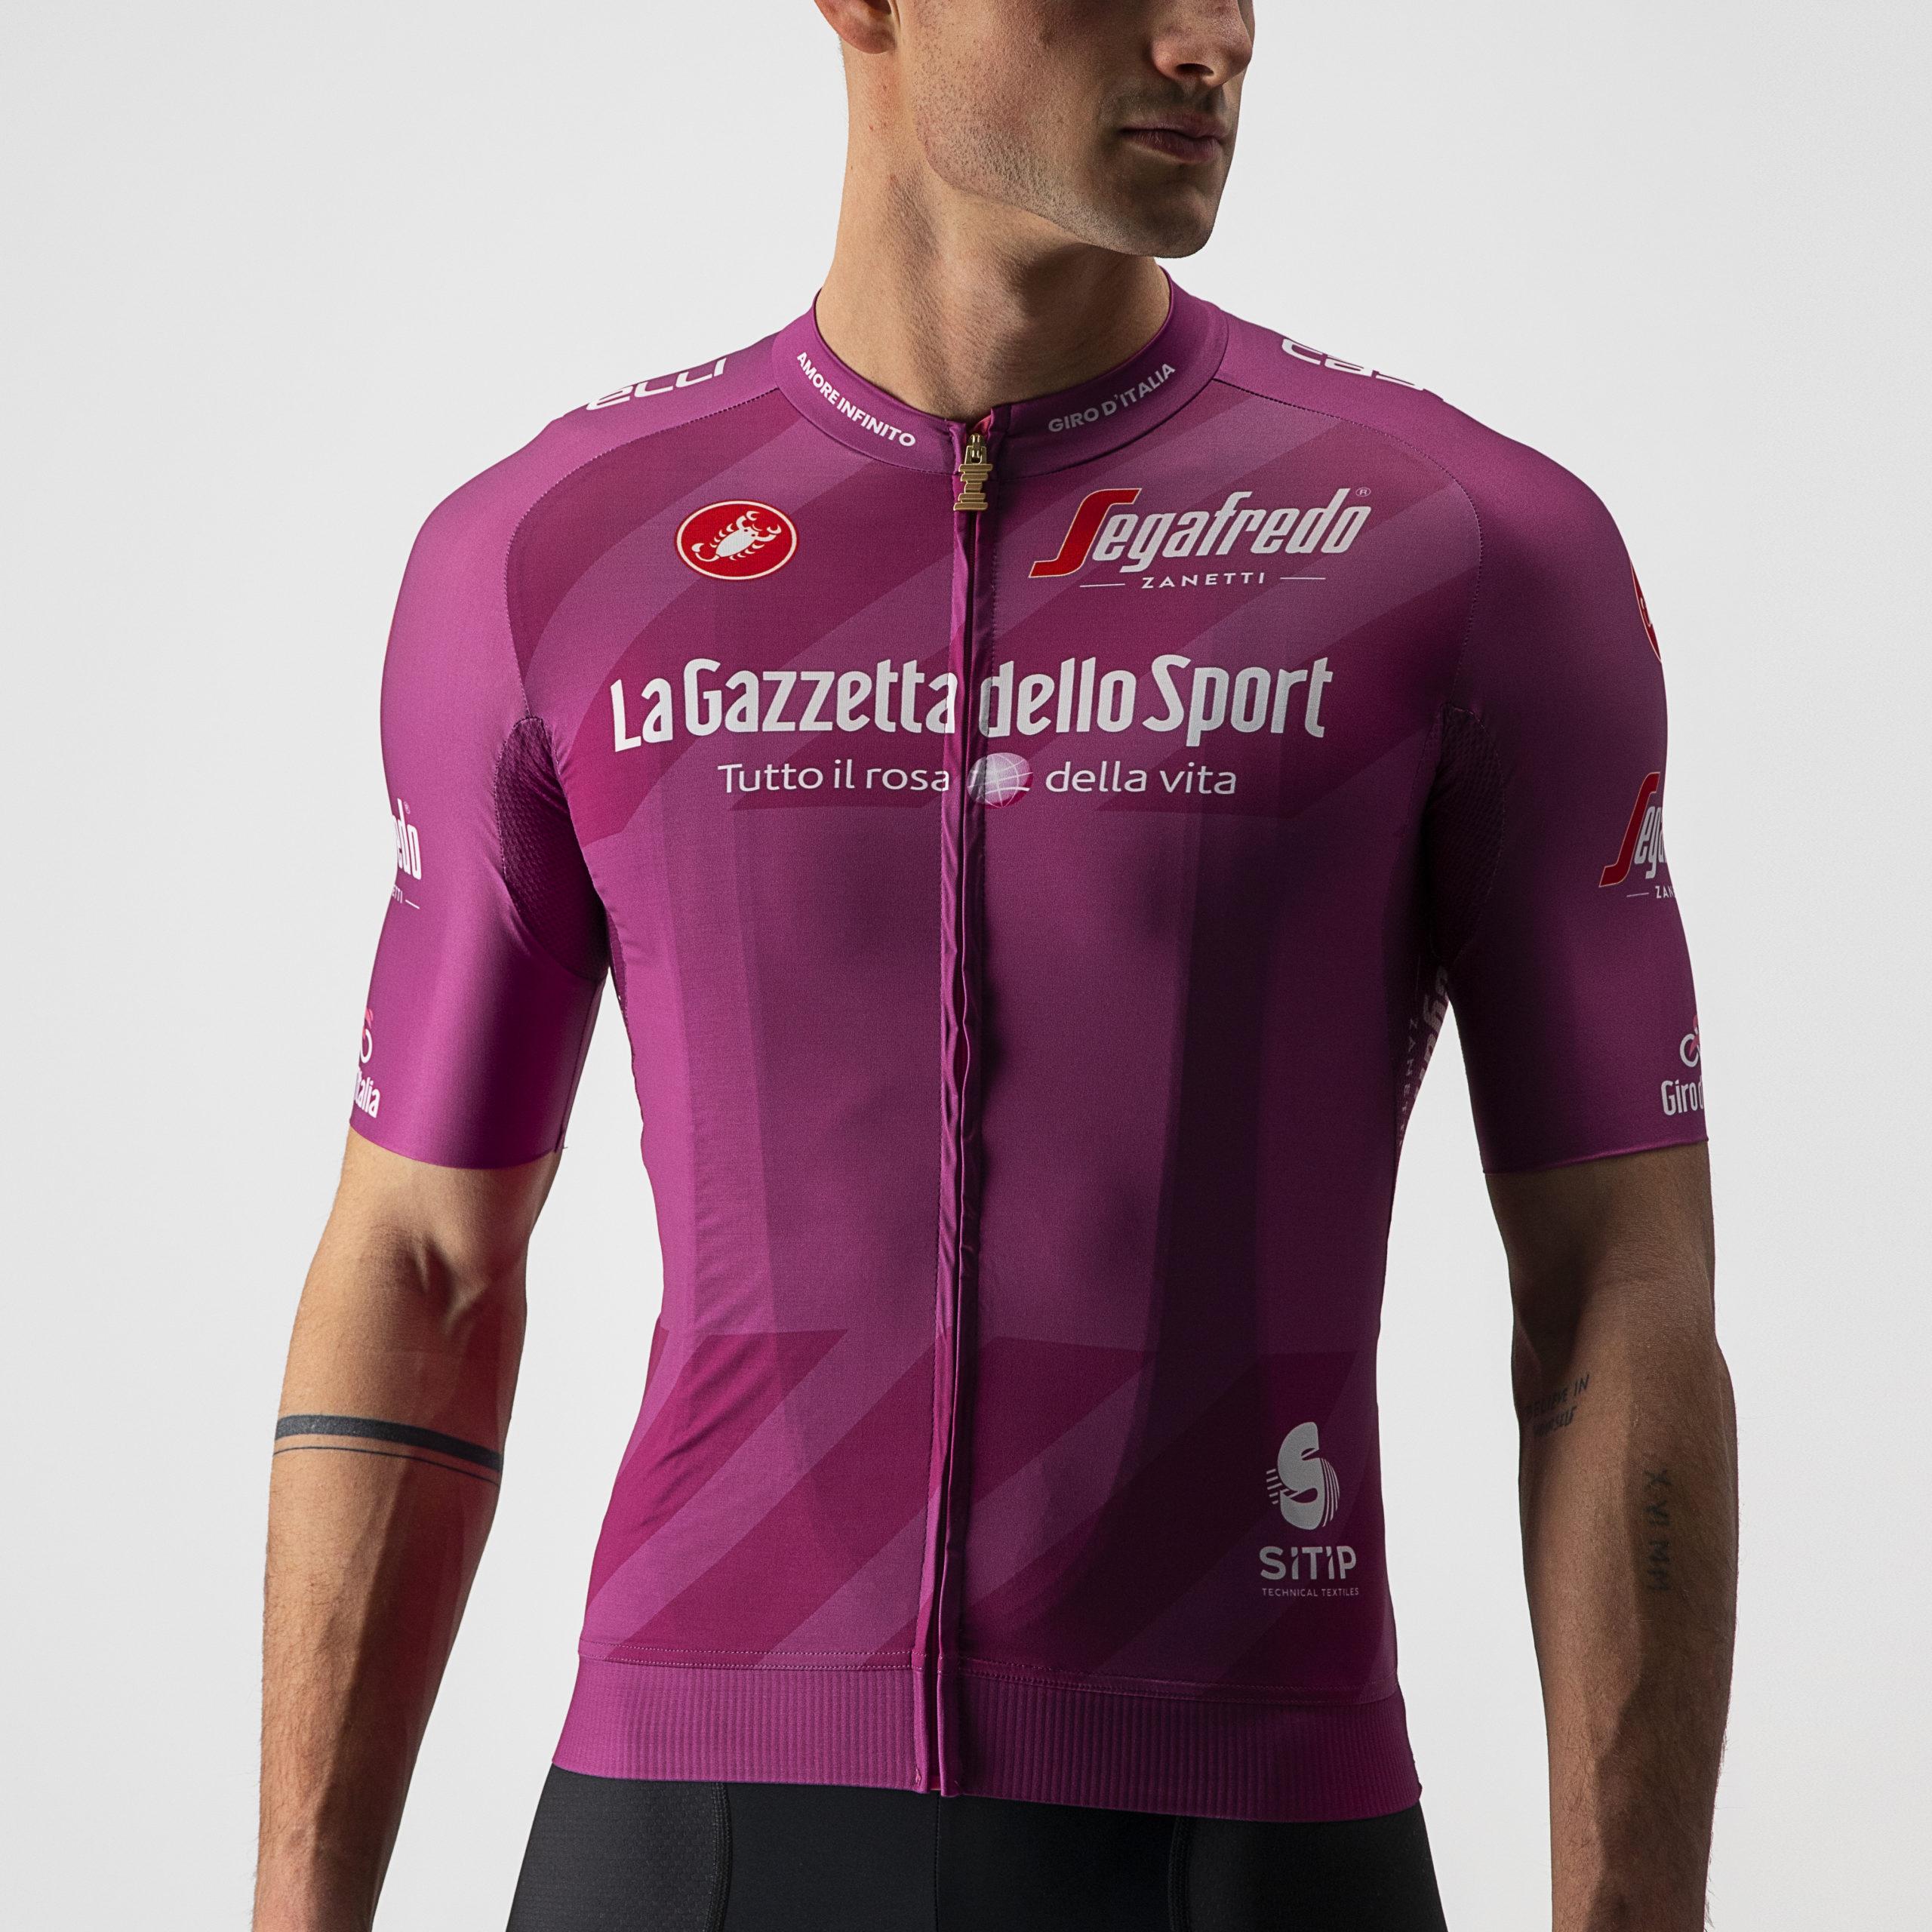 Maglia ciclamino Giro d'Italia 2021